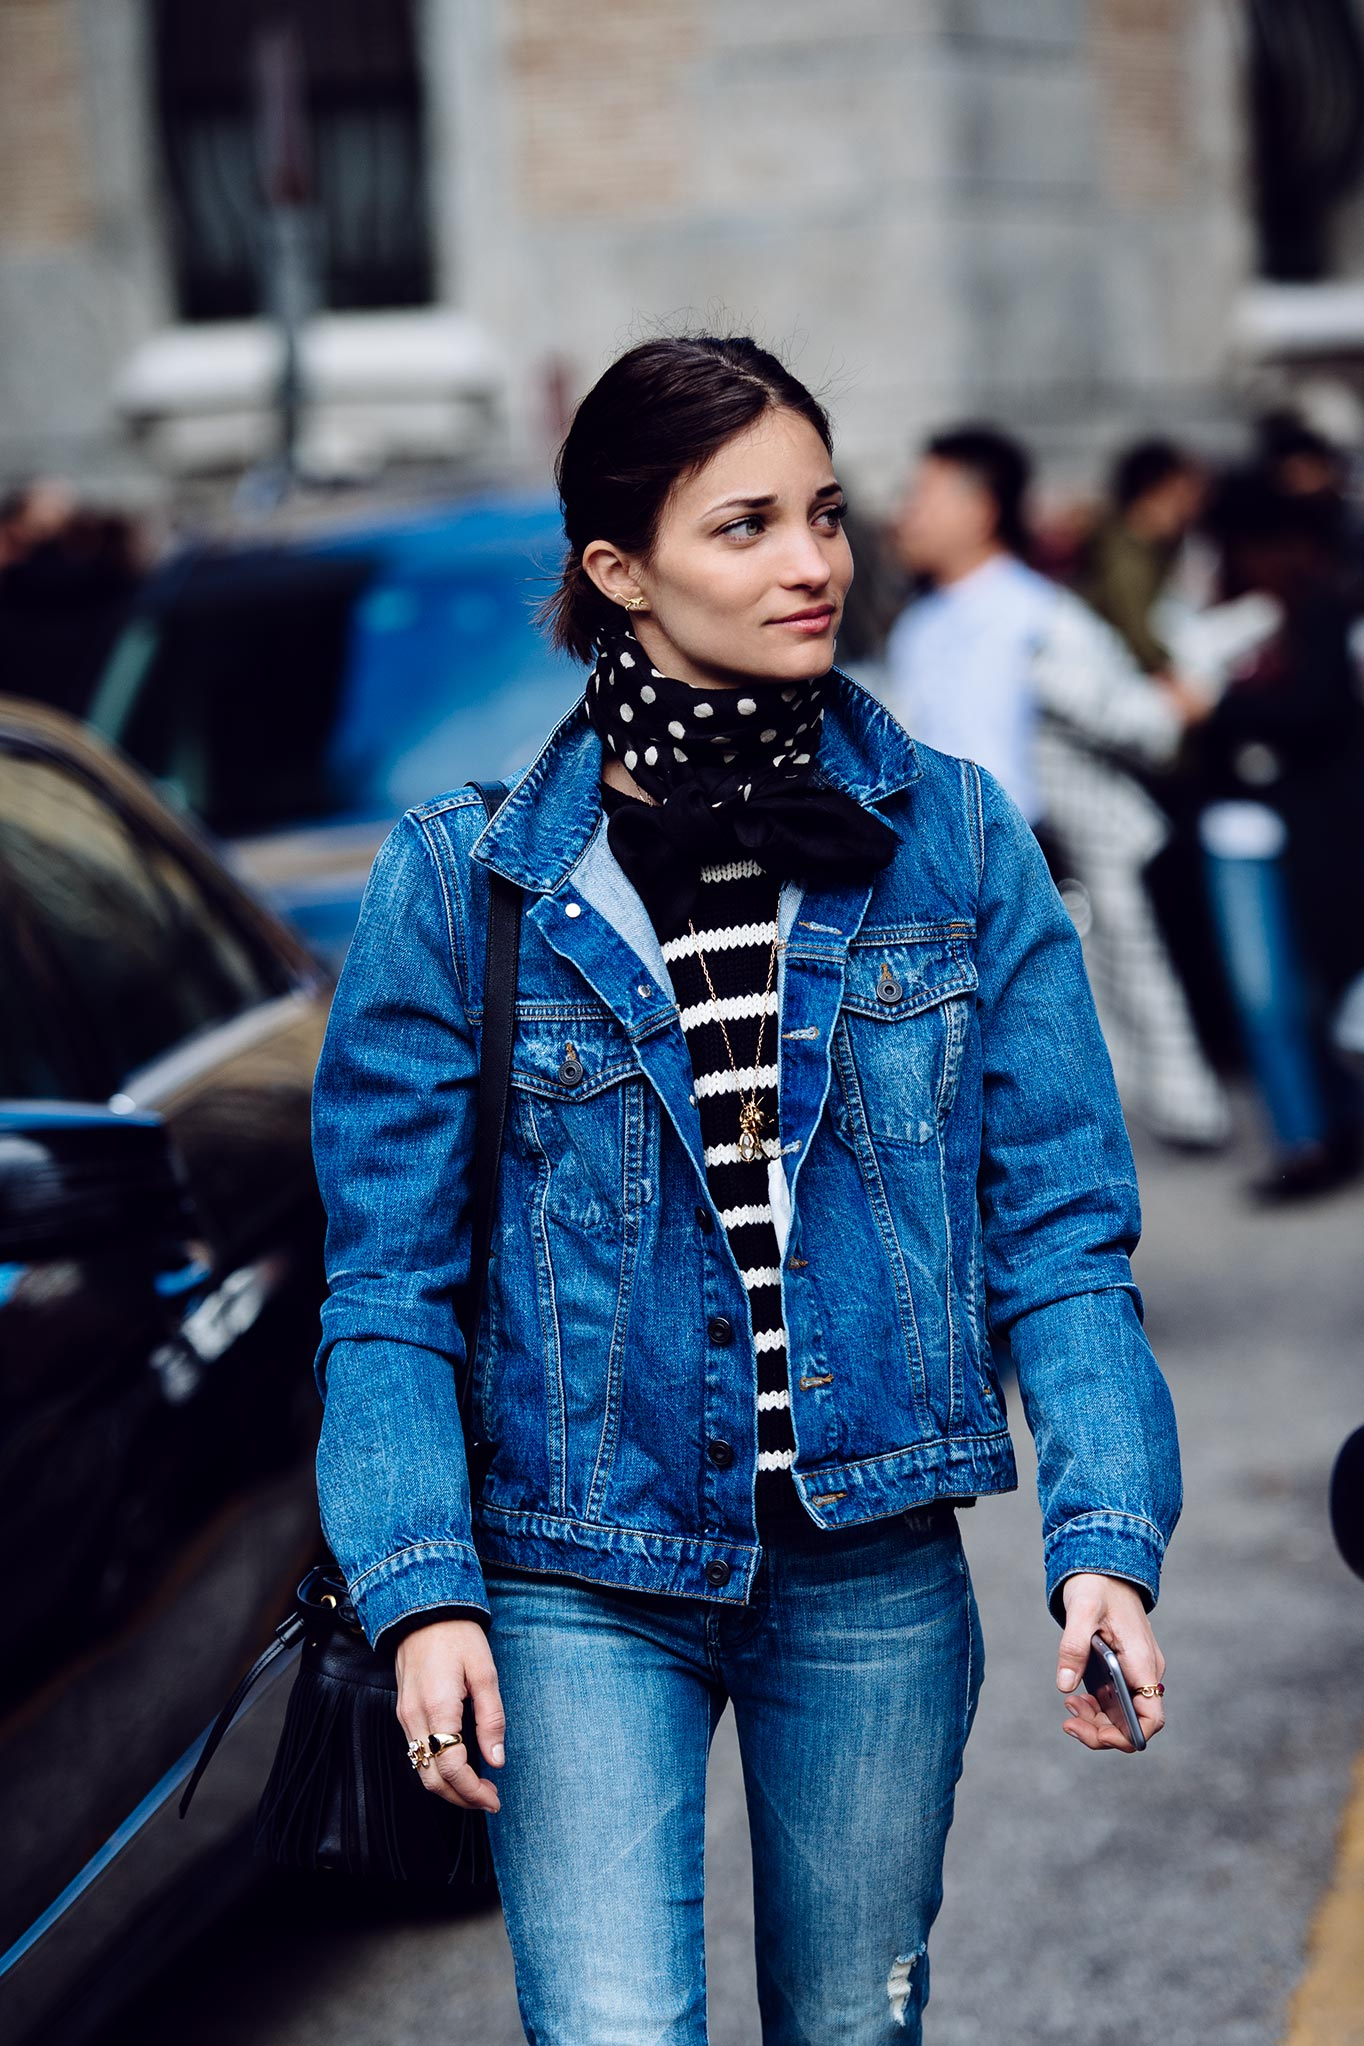 Maria Dueñas Jacobs Blue Jean Look